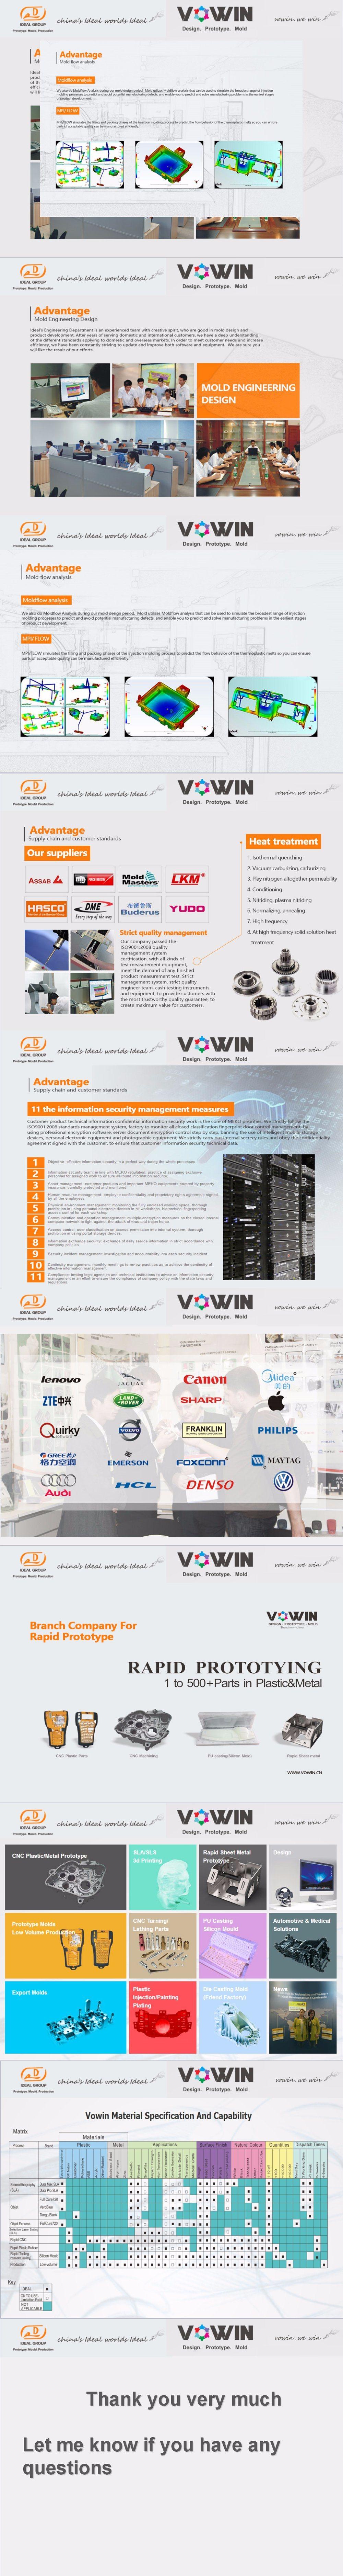 CNC Machine CNC Turning Factory Supplier Electronic Rapid Prototype